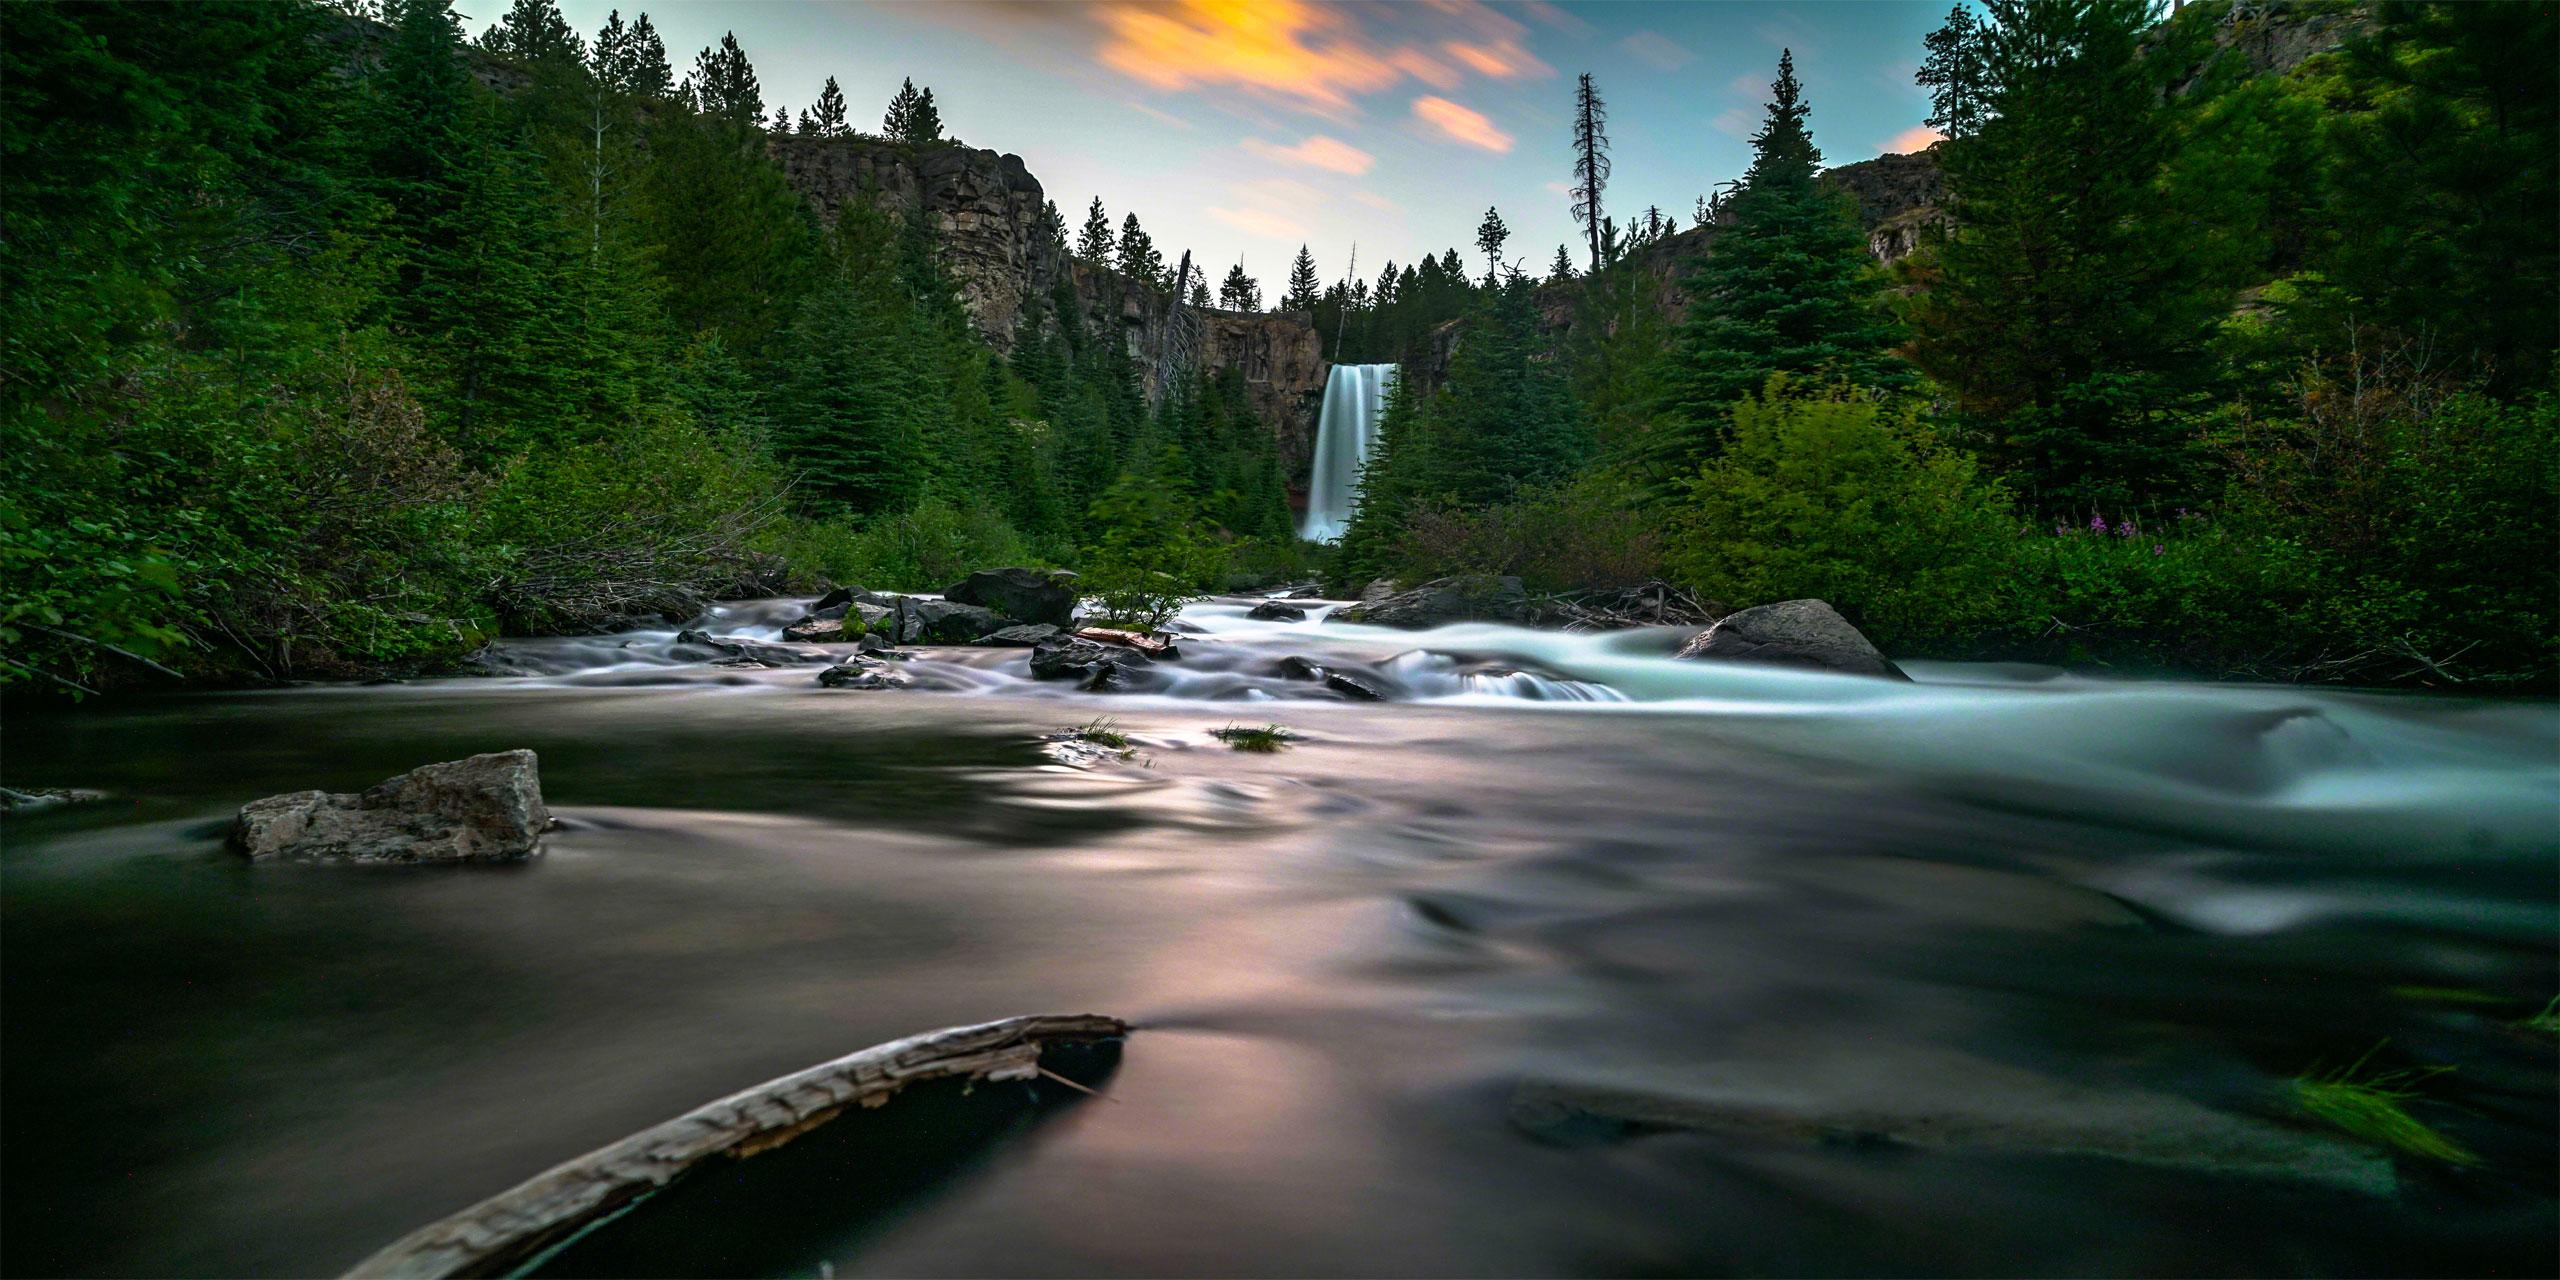 Bend, Oregon; Courtesy of Andrea Soleiman/Shutterstock.com